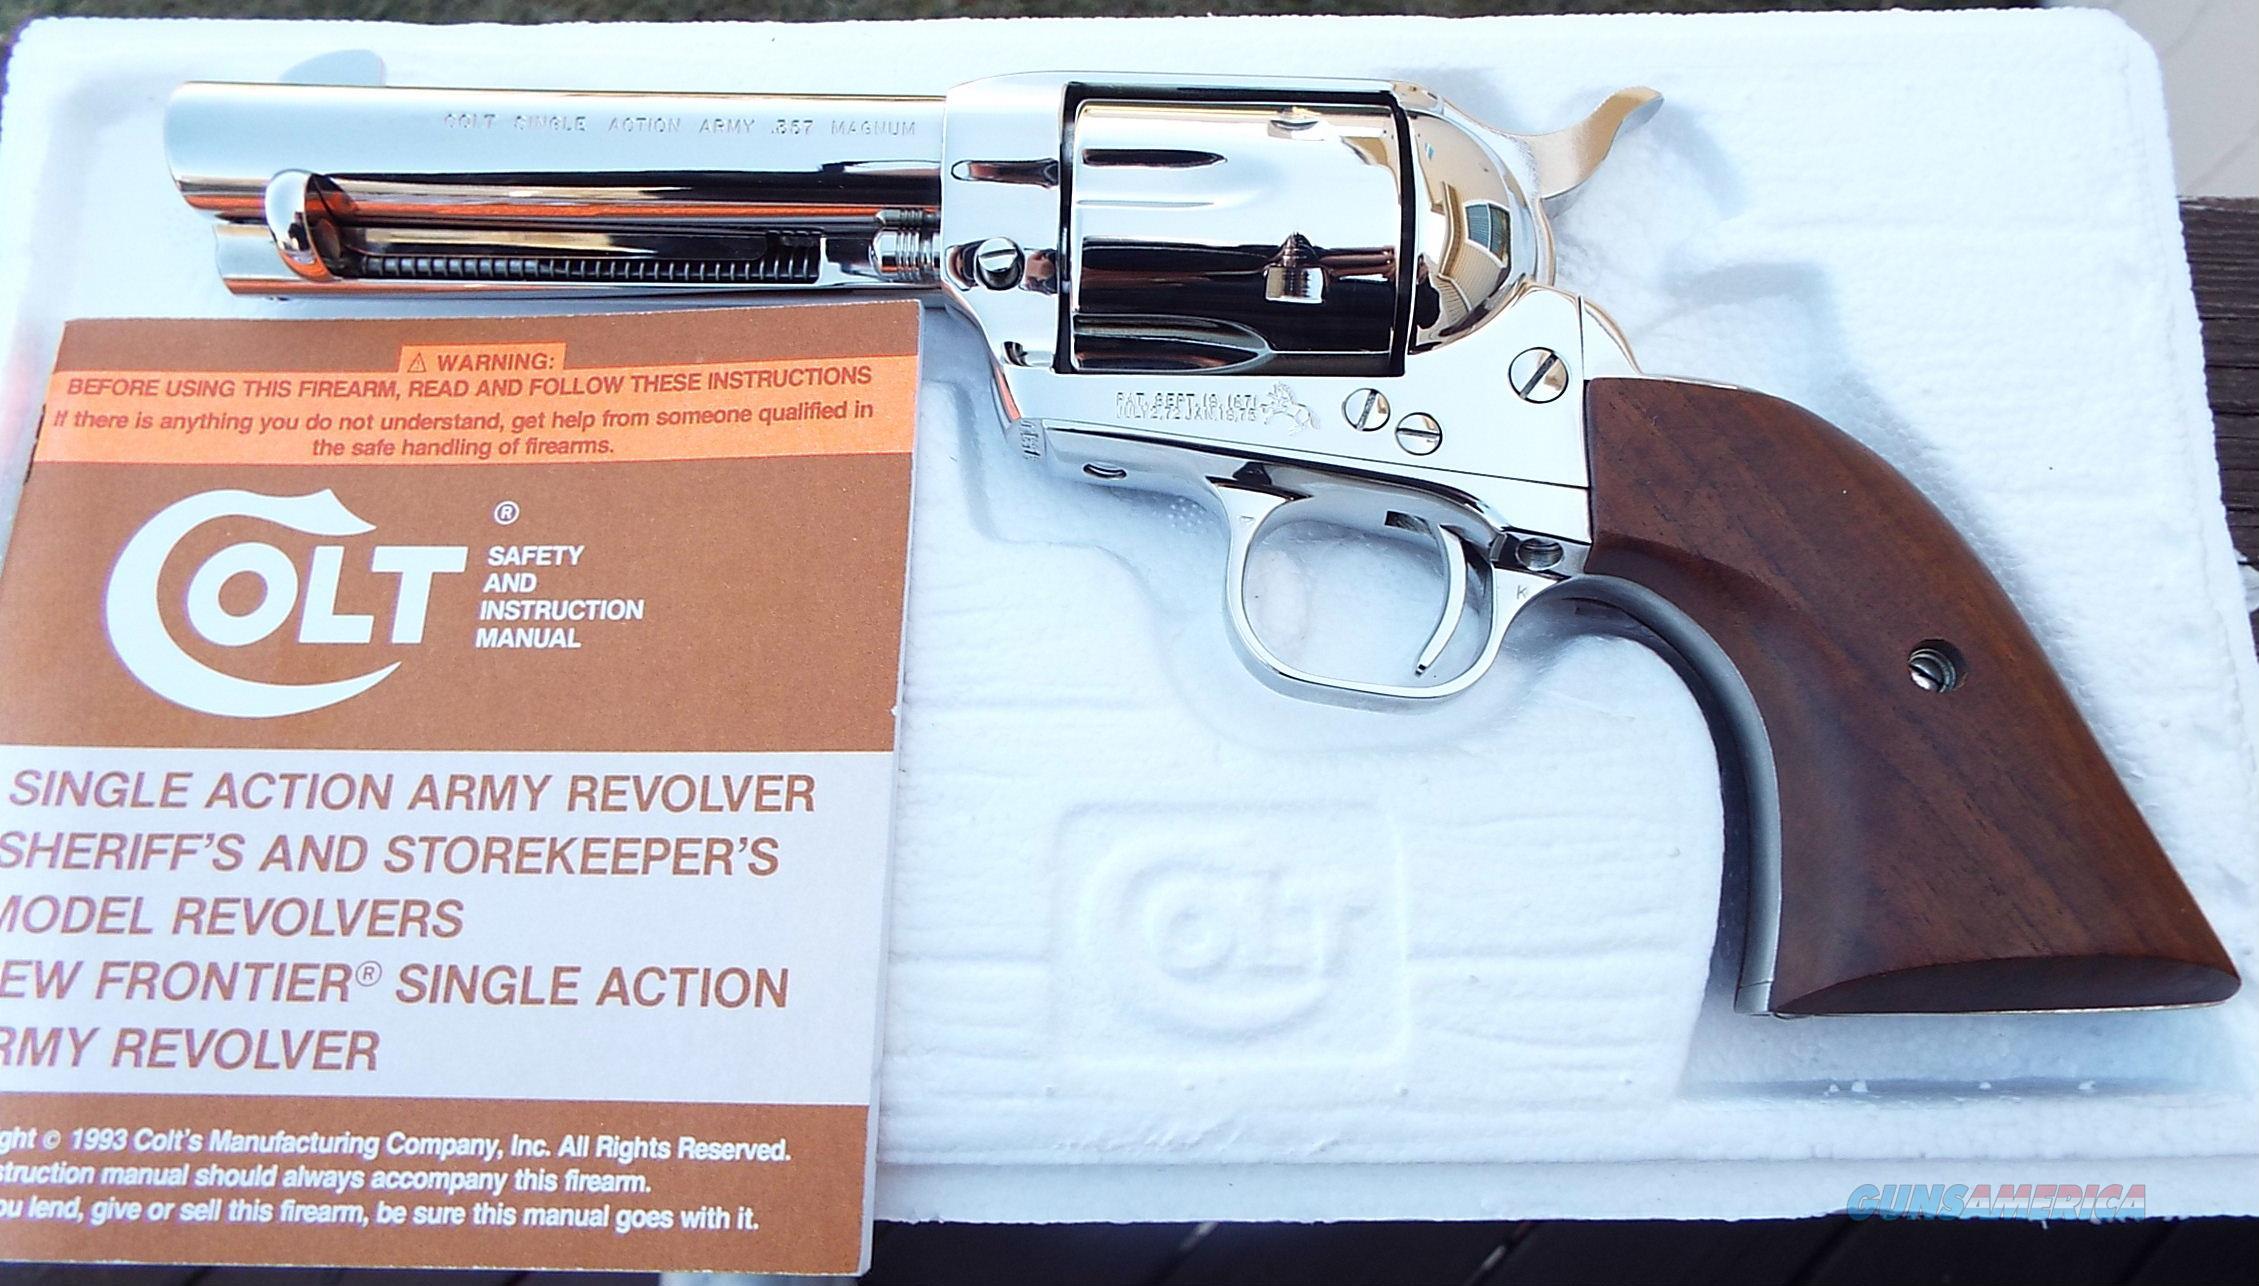 Colt SINGLE ACTION ARMY 3rd Gen. NICKEL 357 Mag. w/ BOX  Guns > Pistols > Colt Single Action Revolvers - 3rd Gen.